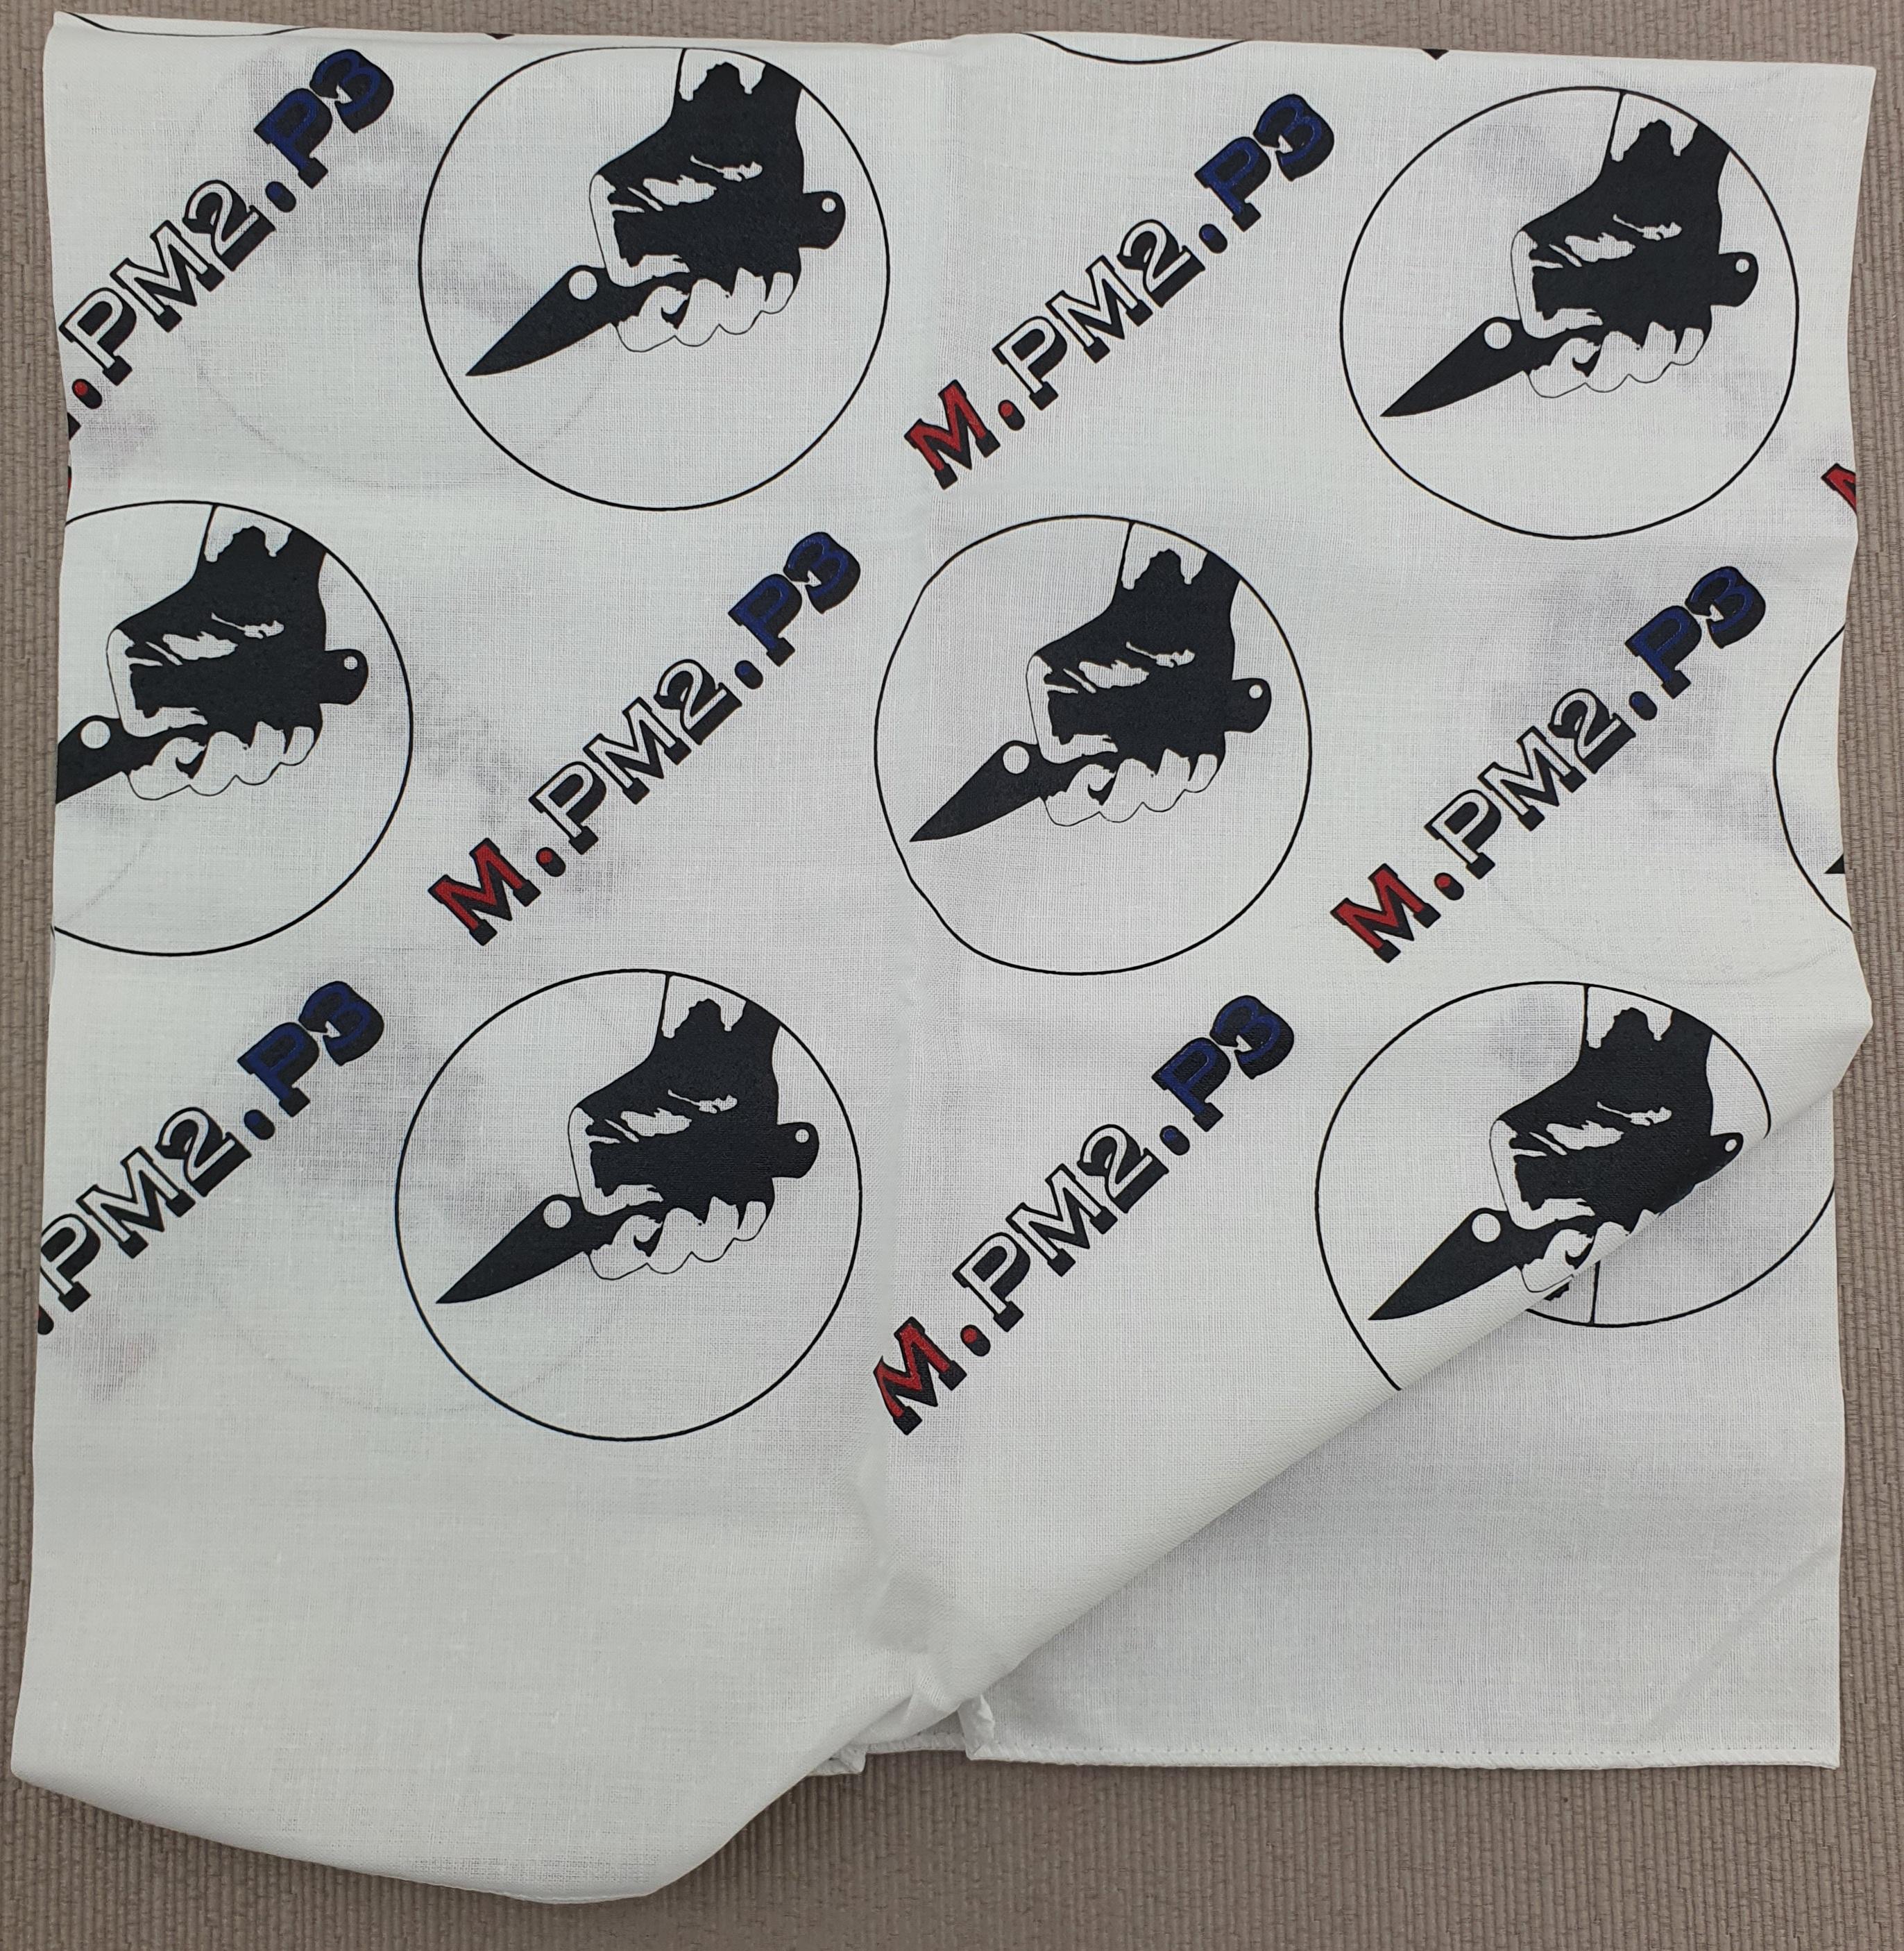 MPM2P3 bandana